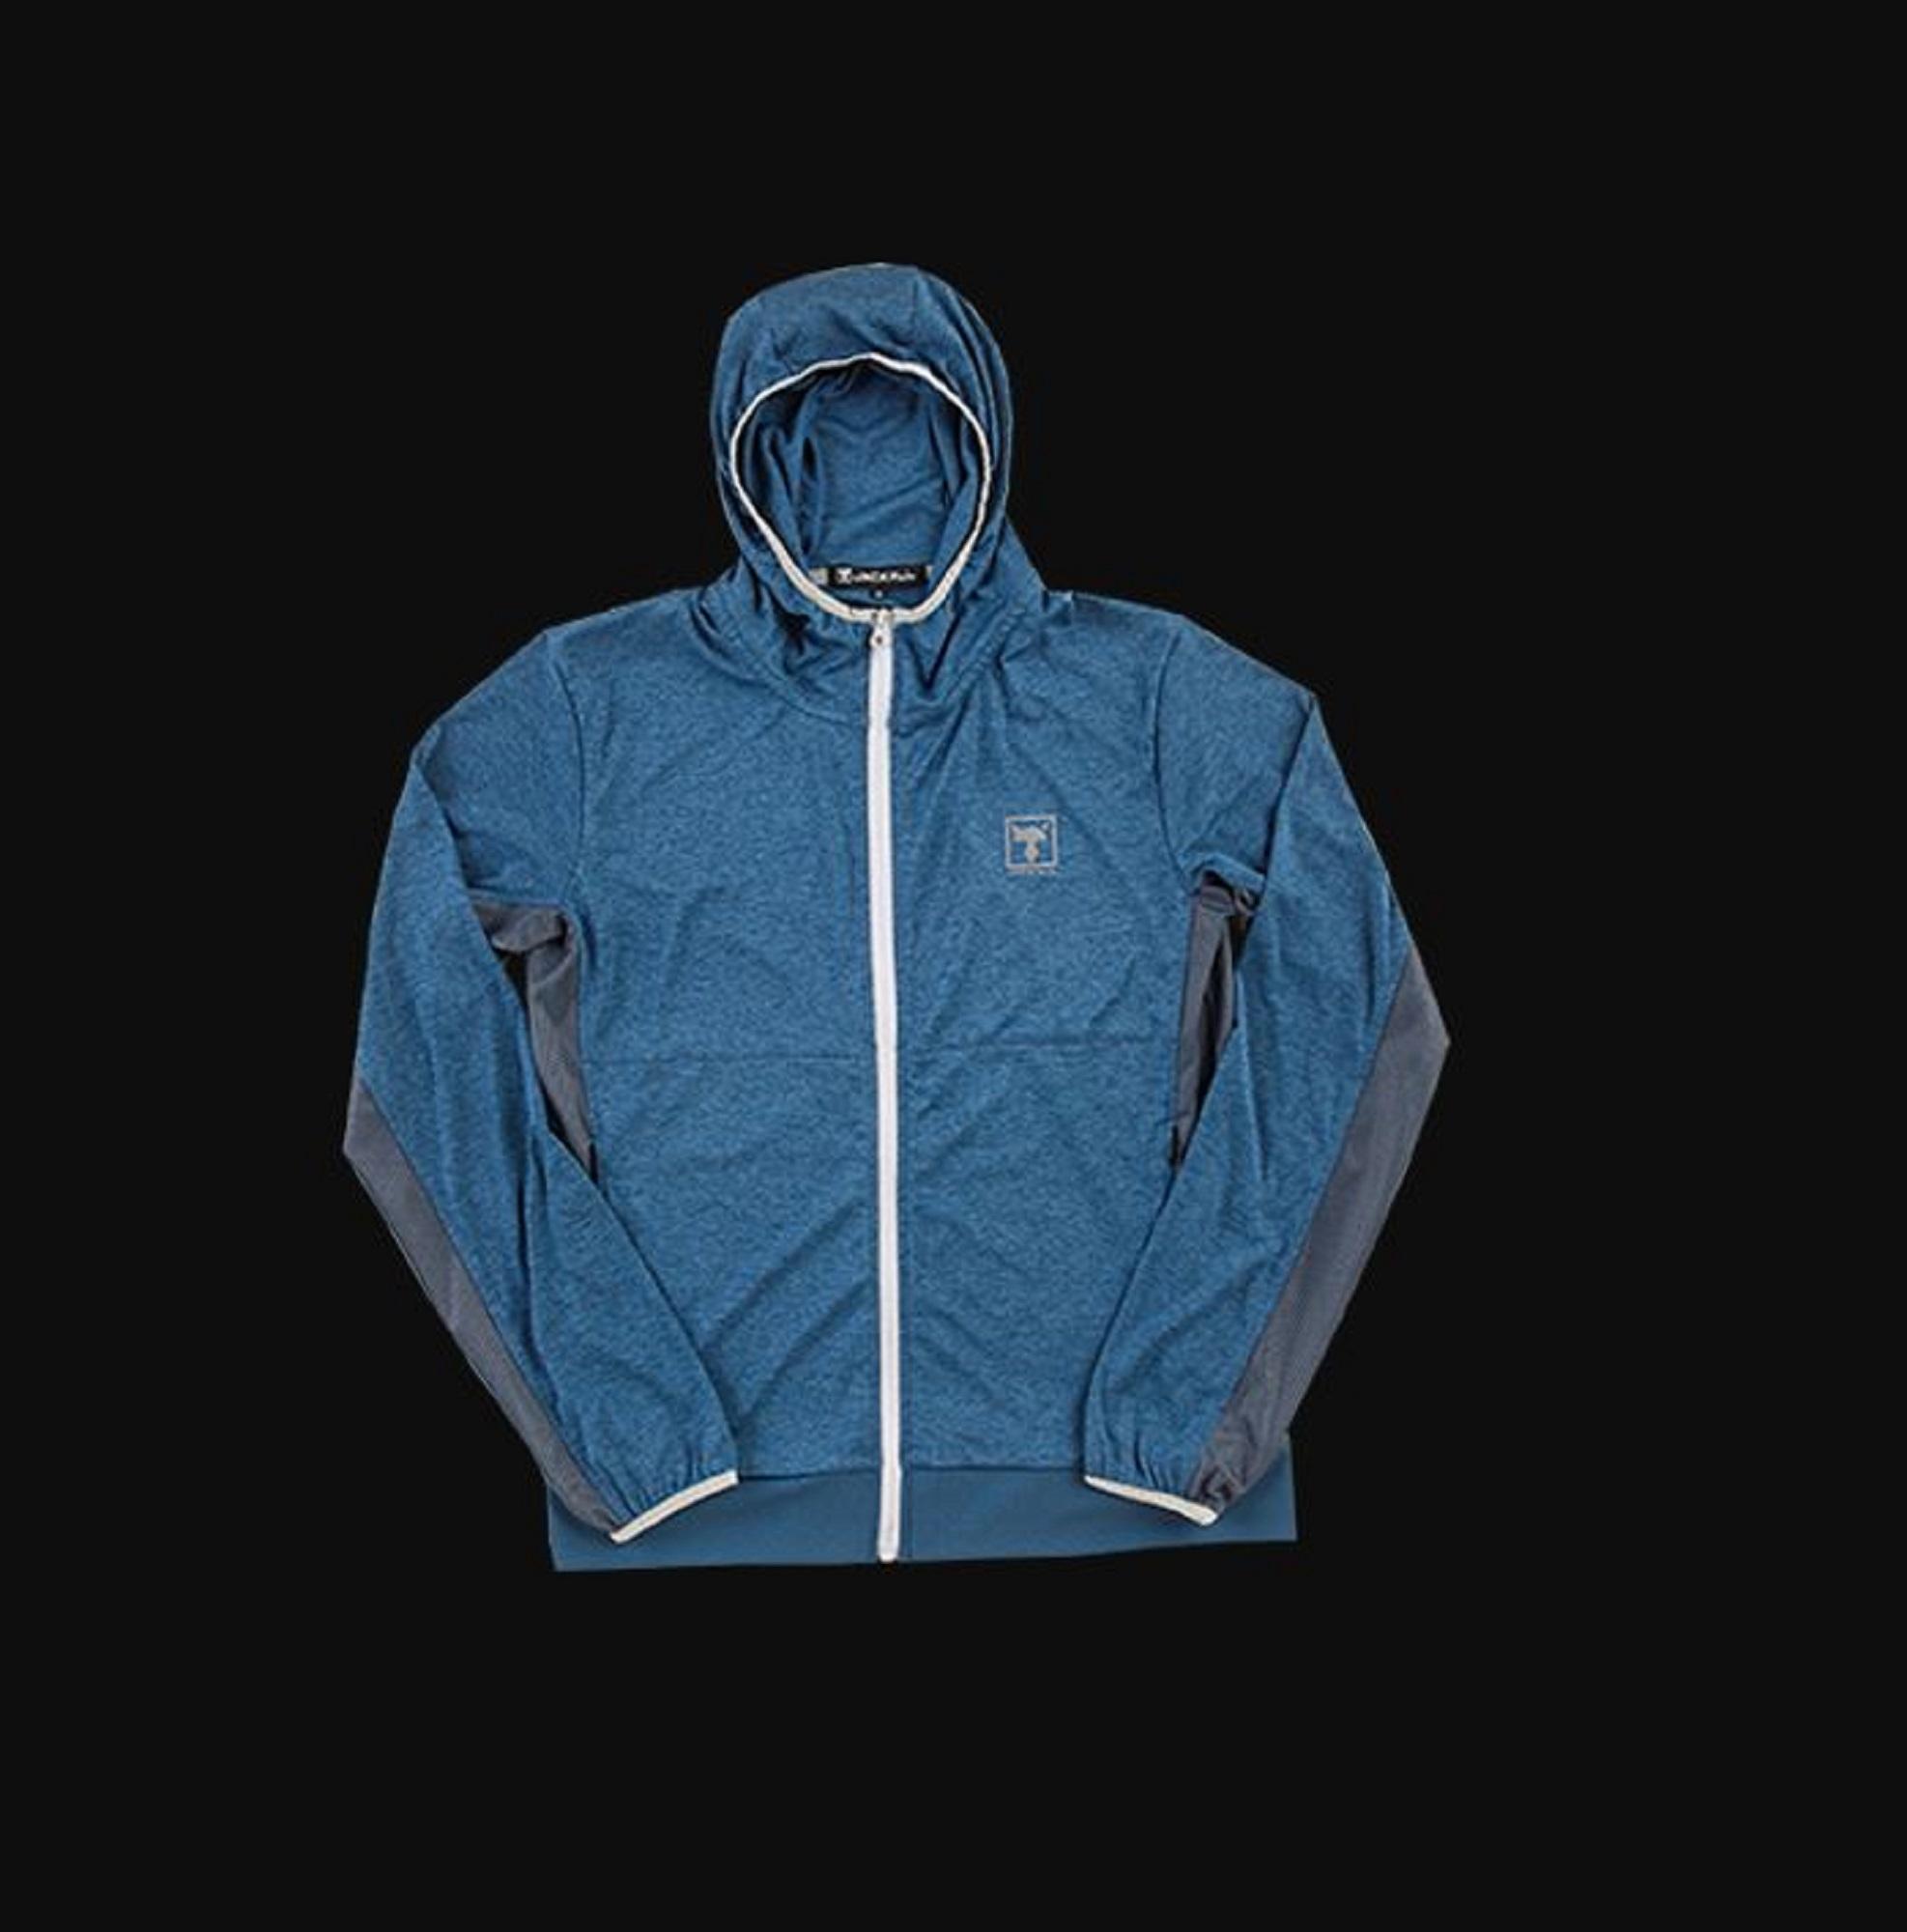 Jackall Light Hoodie Original Merchandise Size L Blue (8843)